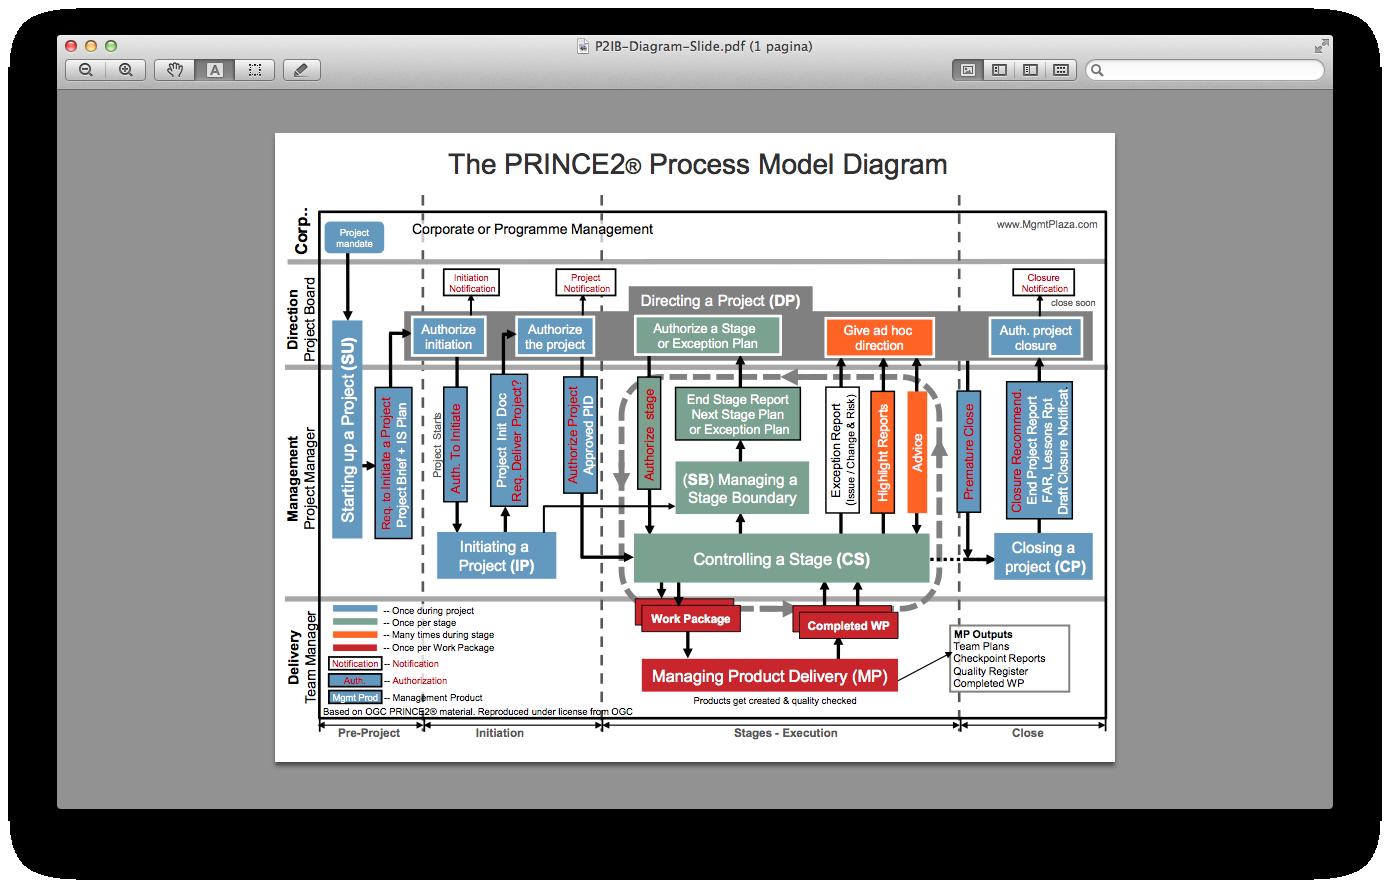 prince2 in picture henny portman s blog rh hennyportman wordpress com Production Control Plan Flow Charts Manufacturing Flow Diagram